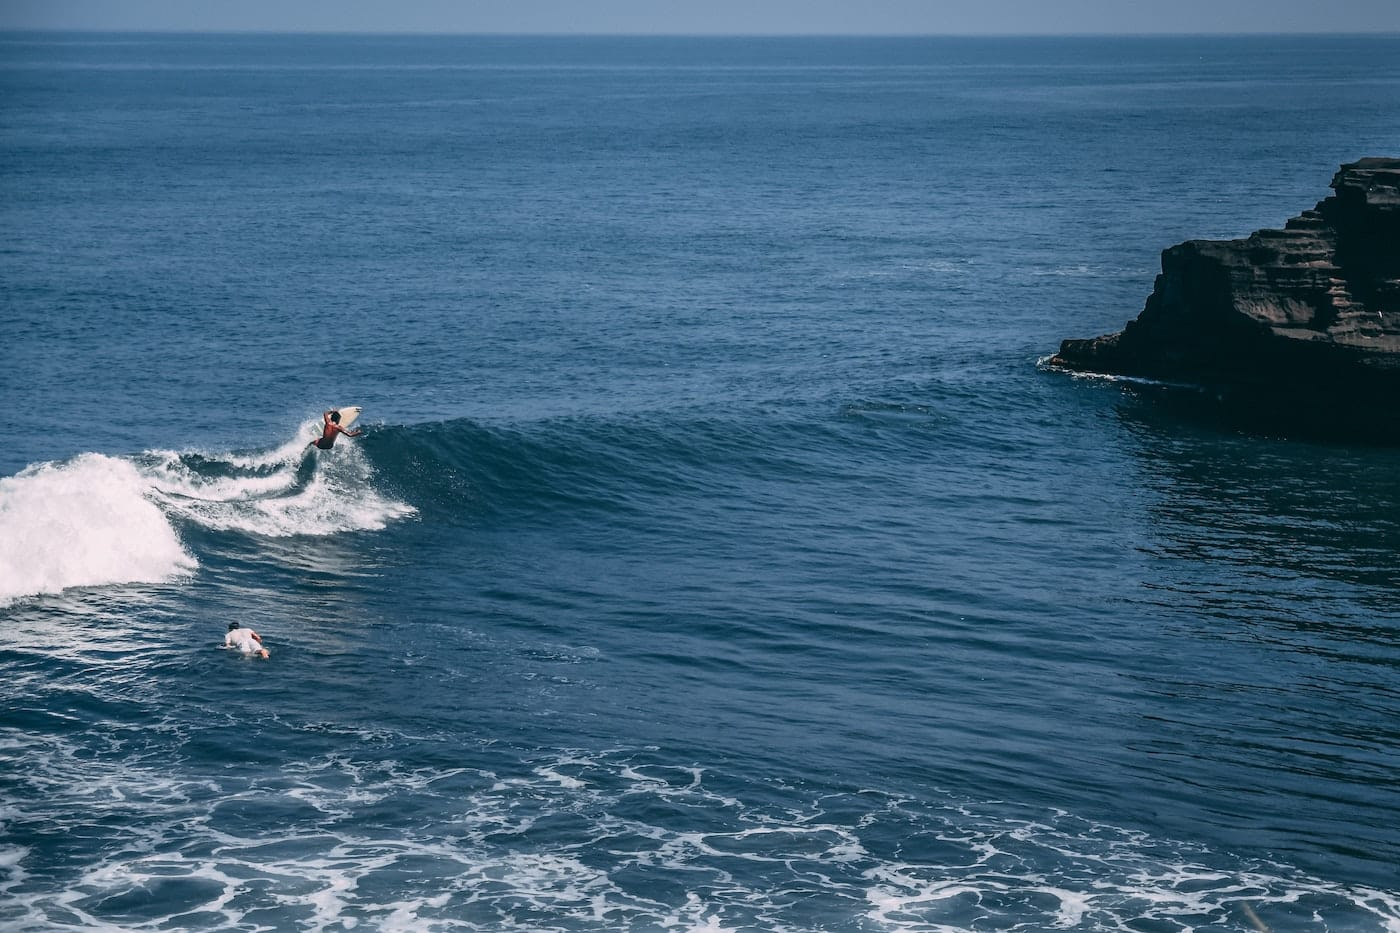 A Primer on Ulu: Surfing and Surfcamps in Uluwatu, Bali [Video]